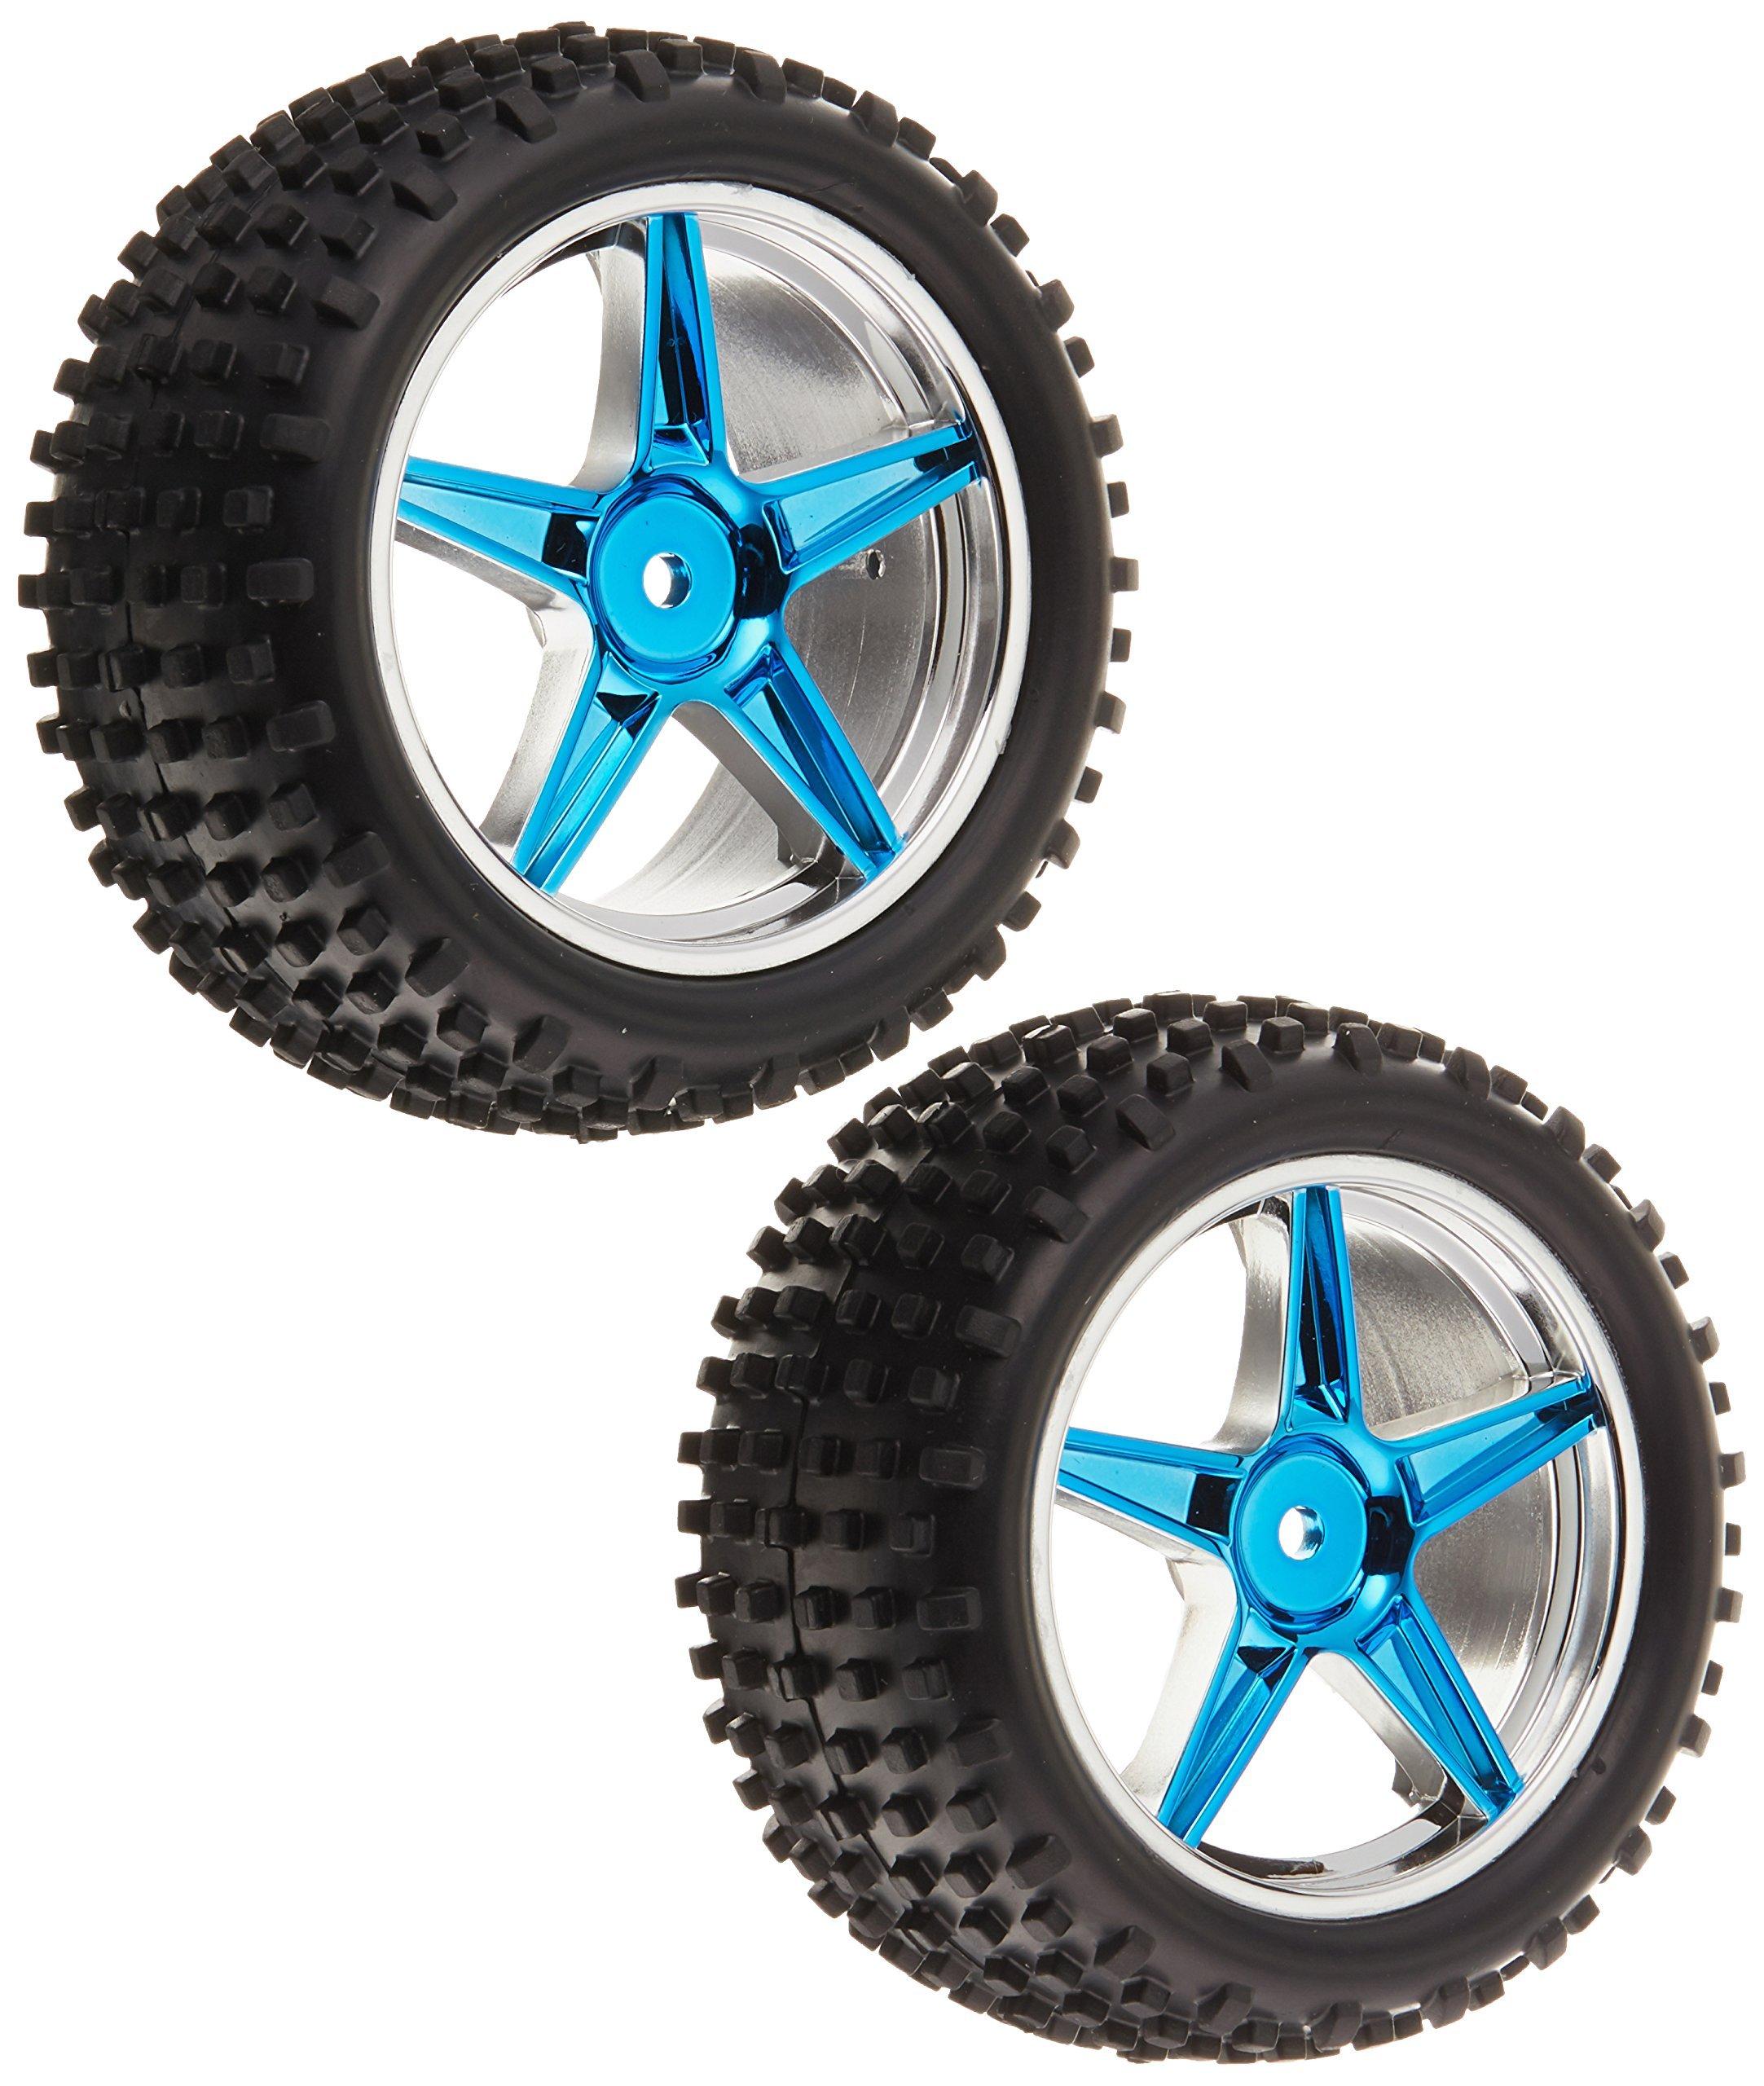 Redcat Racing 06026PB Complete Rear Wheels (Blue, 2Piece)